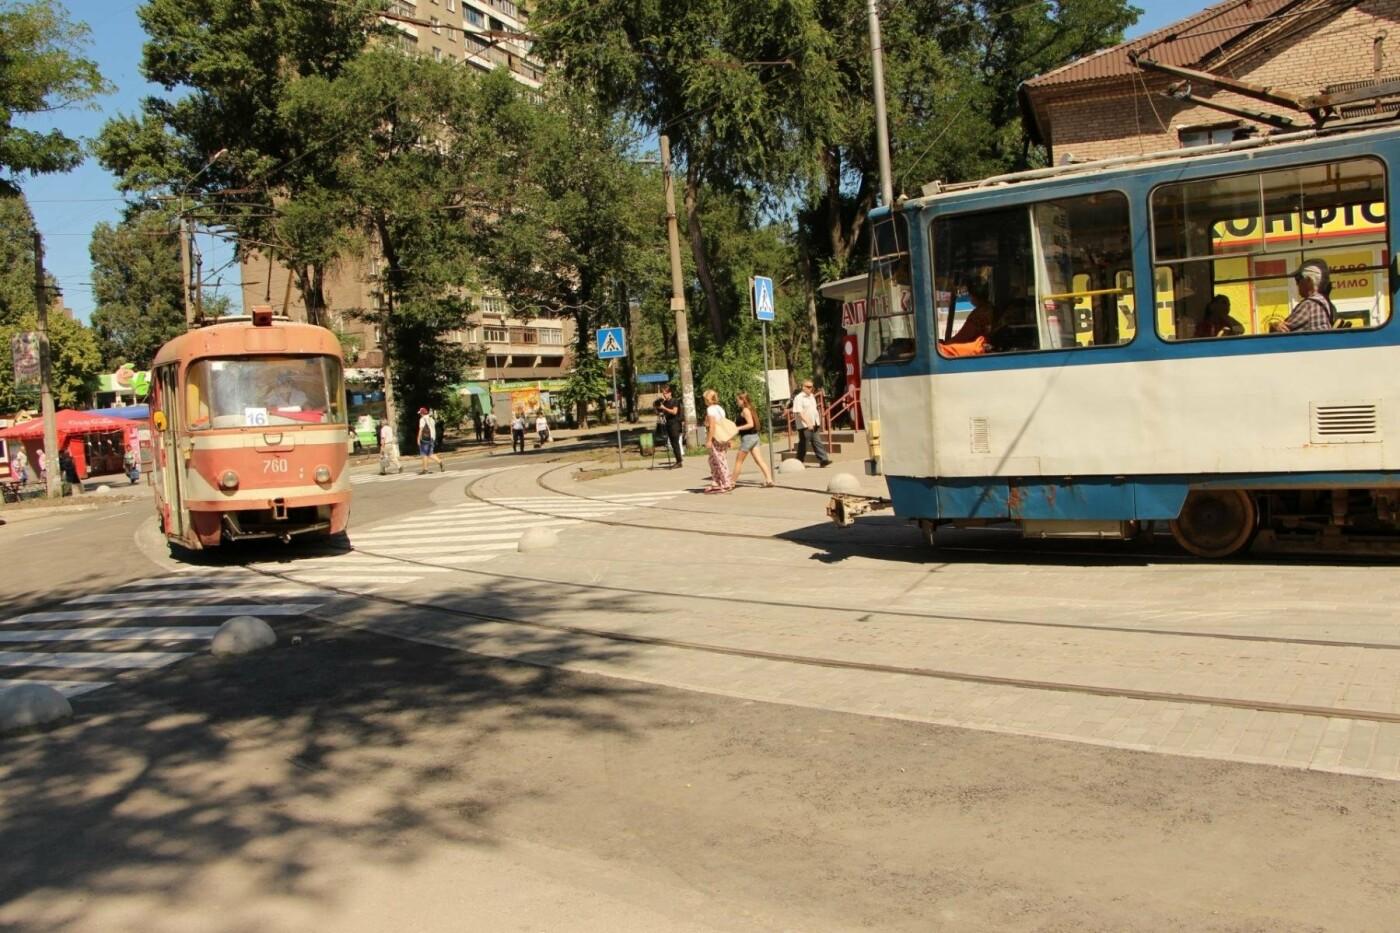 В Запорожье заканчивают ремонт-долгострой трамвайного пути на Кичкасе, – ФОТО, фото-2